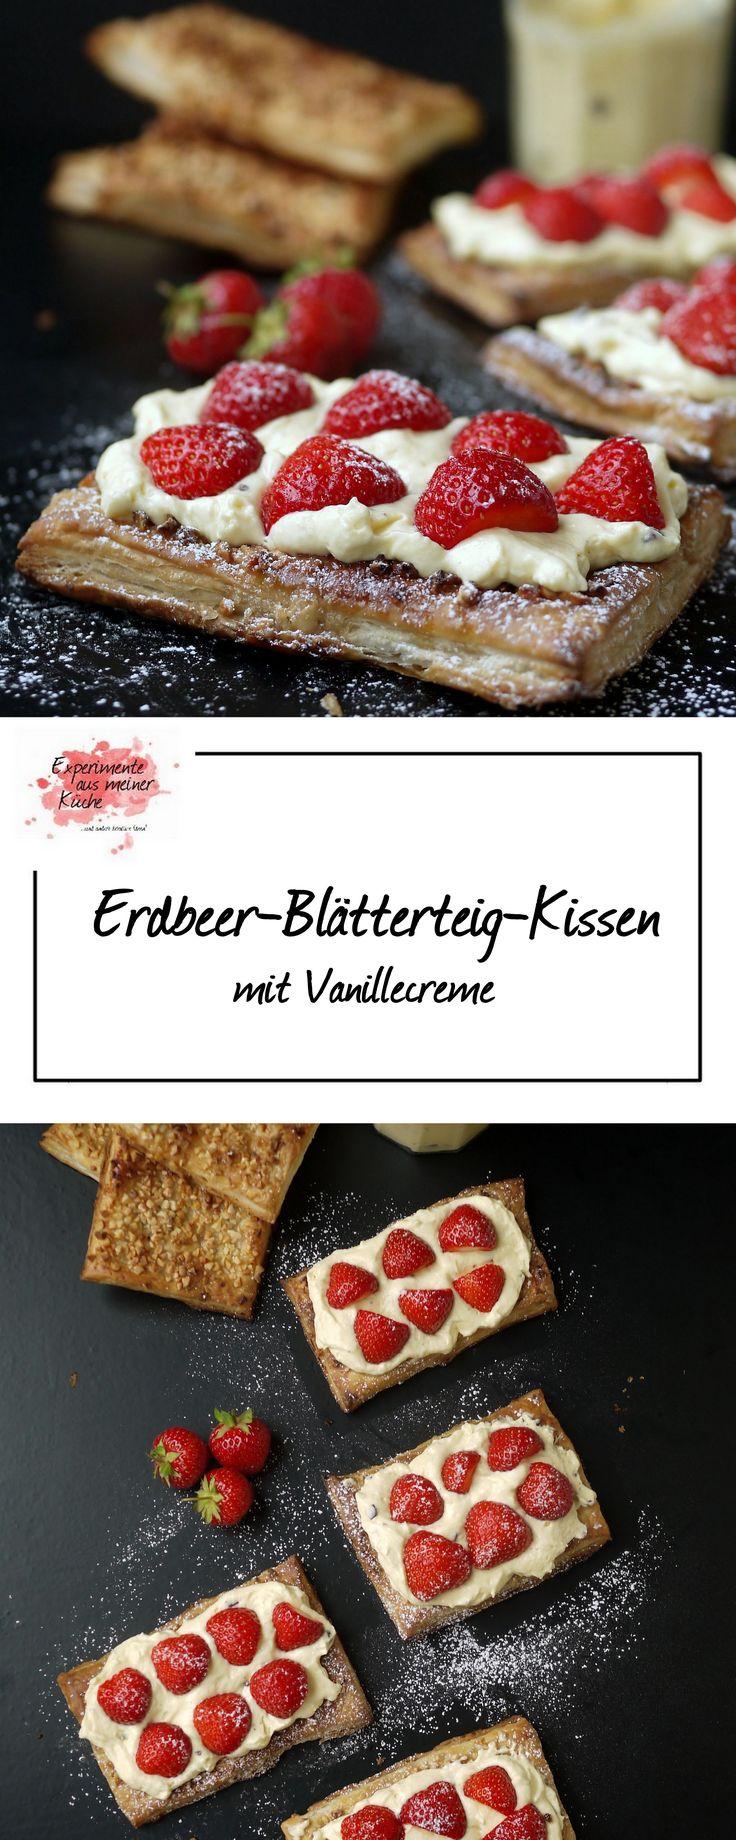 Erdbeer-Blätterteig-Kissen | Rezept | Backen | Dessert